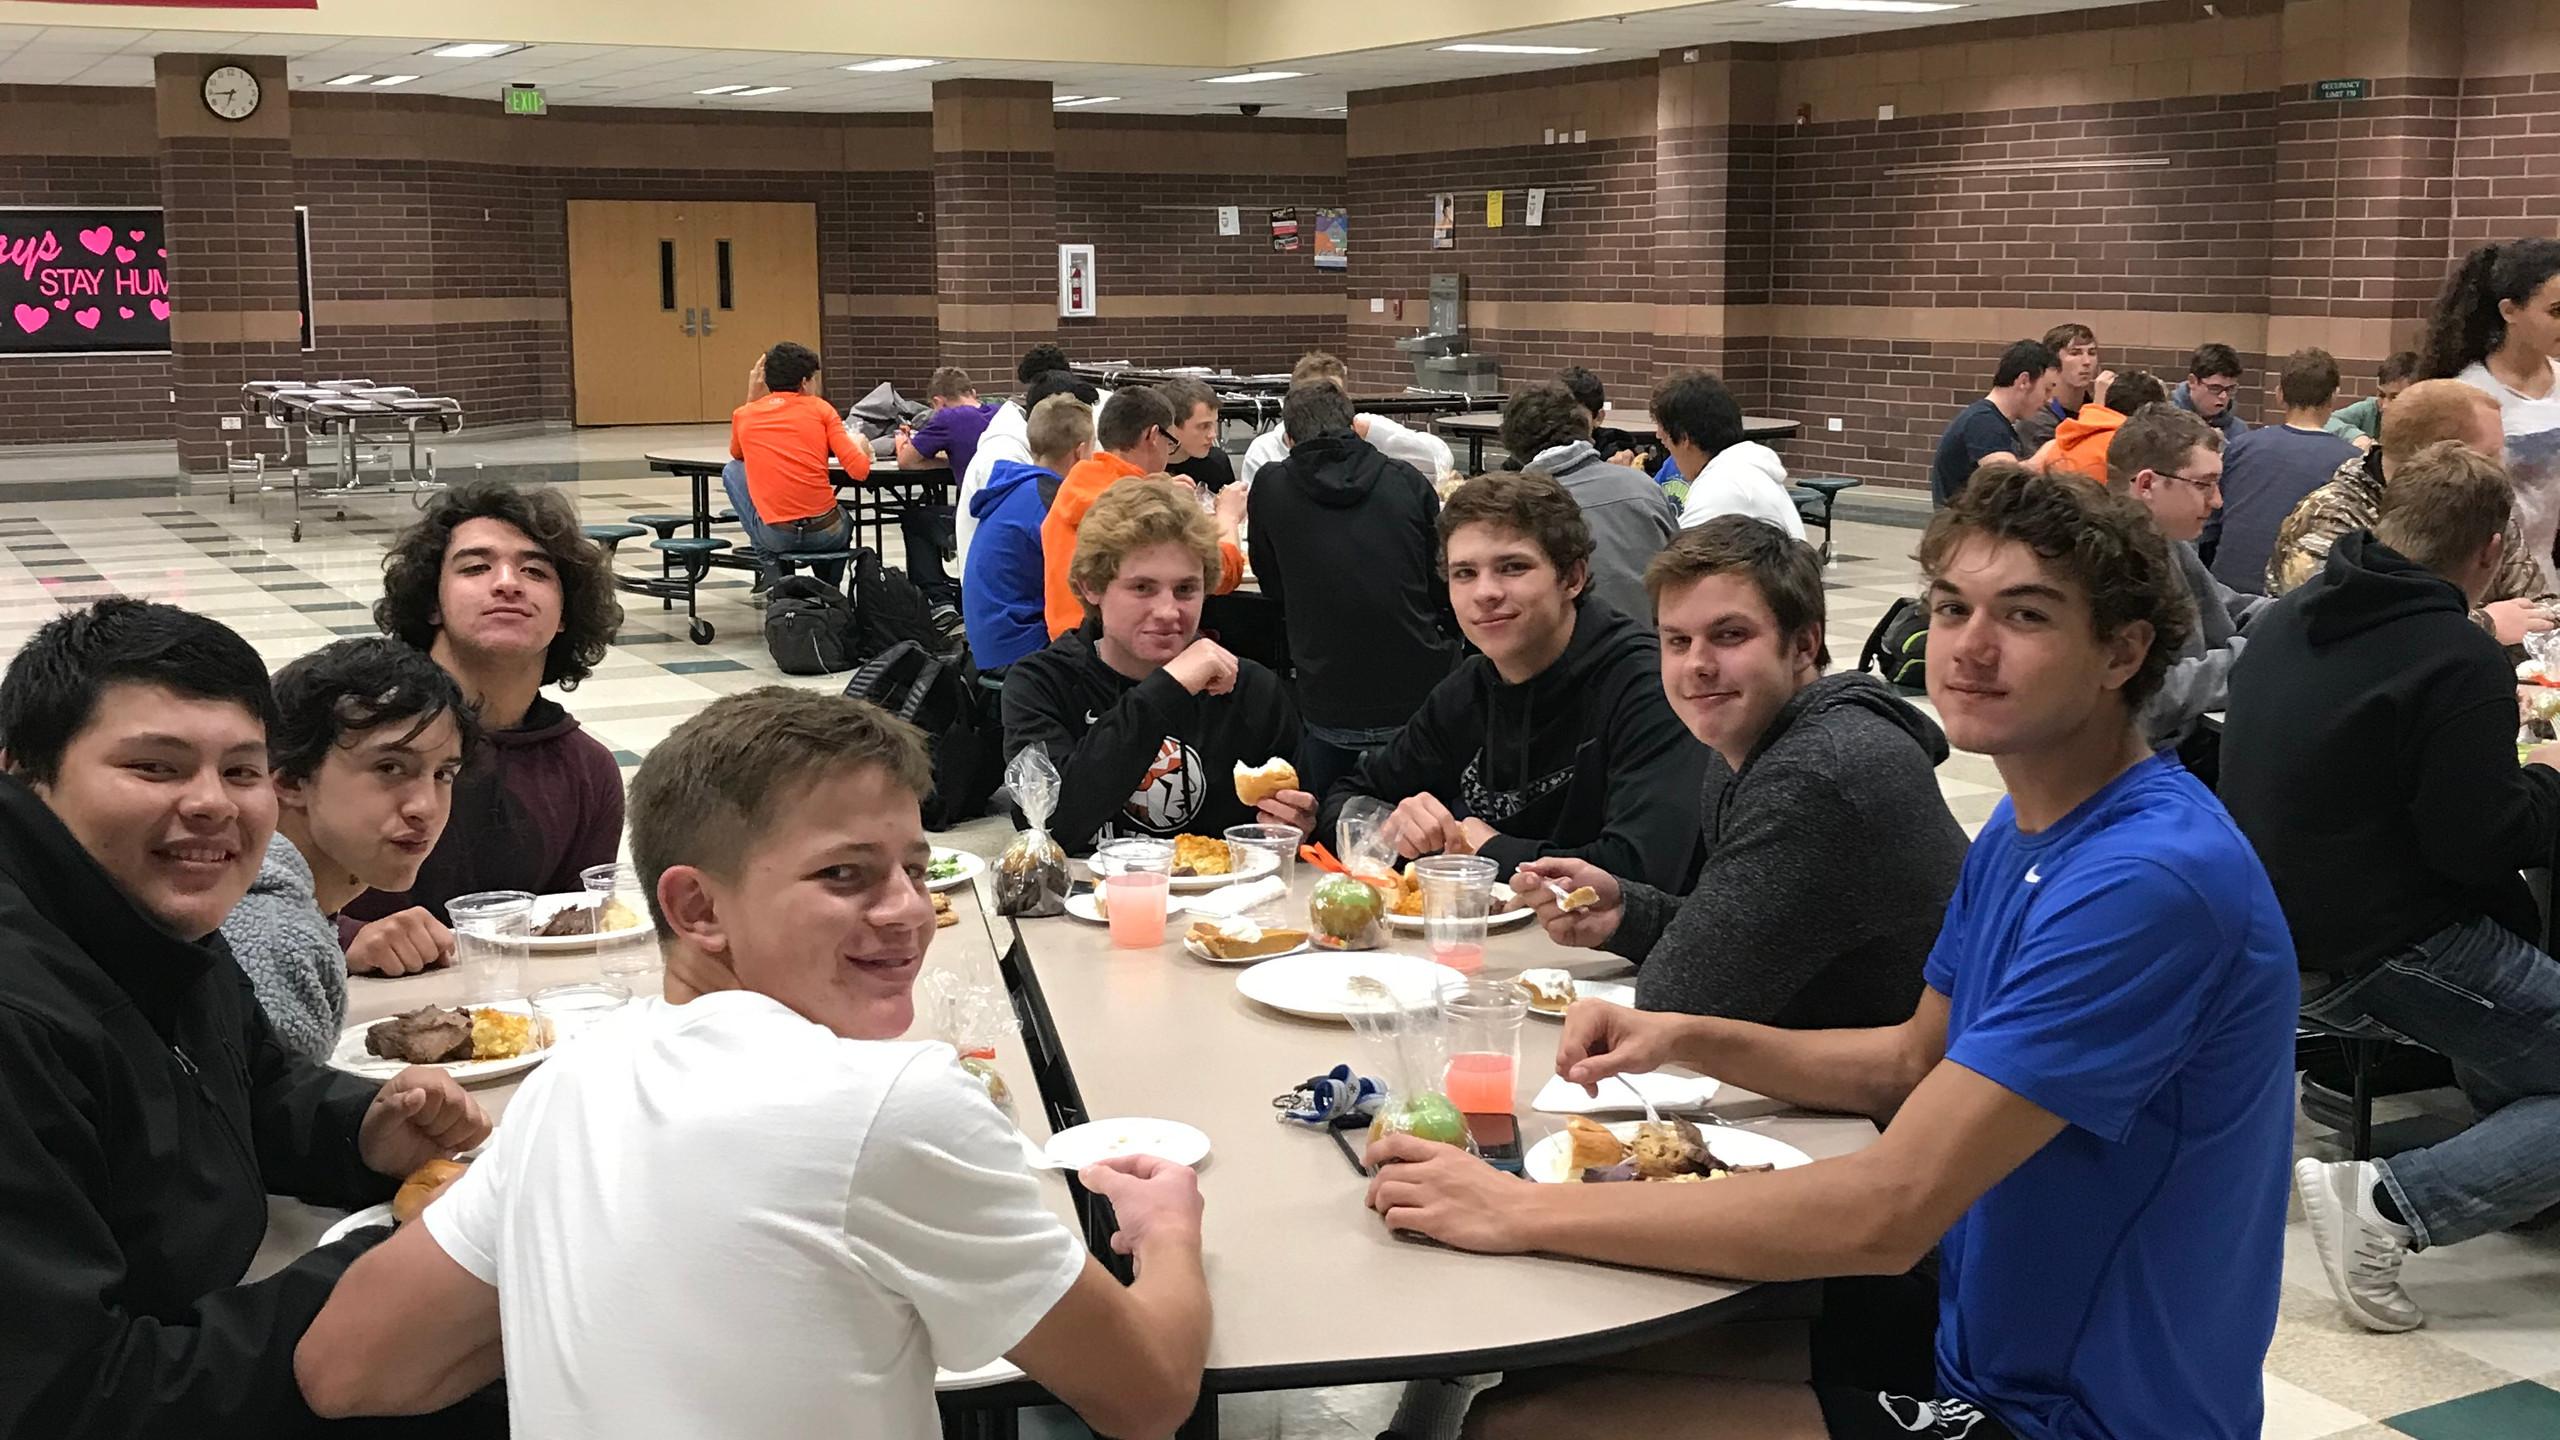 The Football boys enjoy a meal together for their Senior Night.